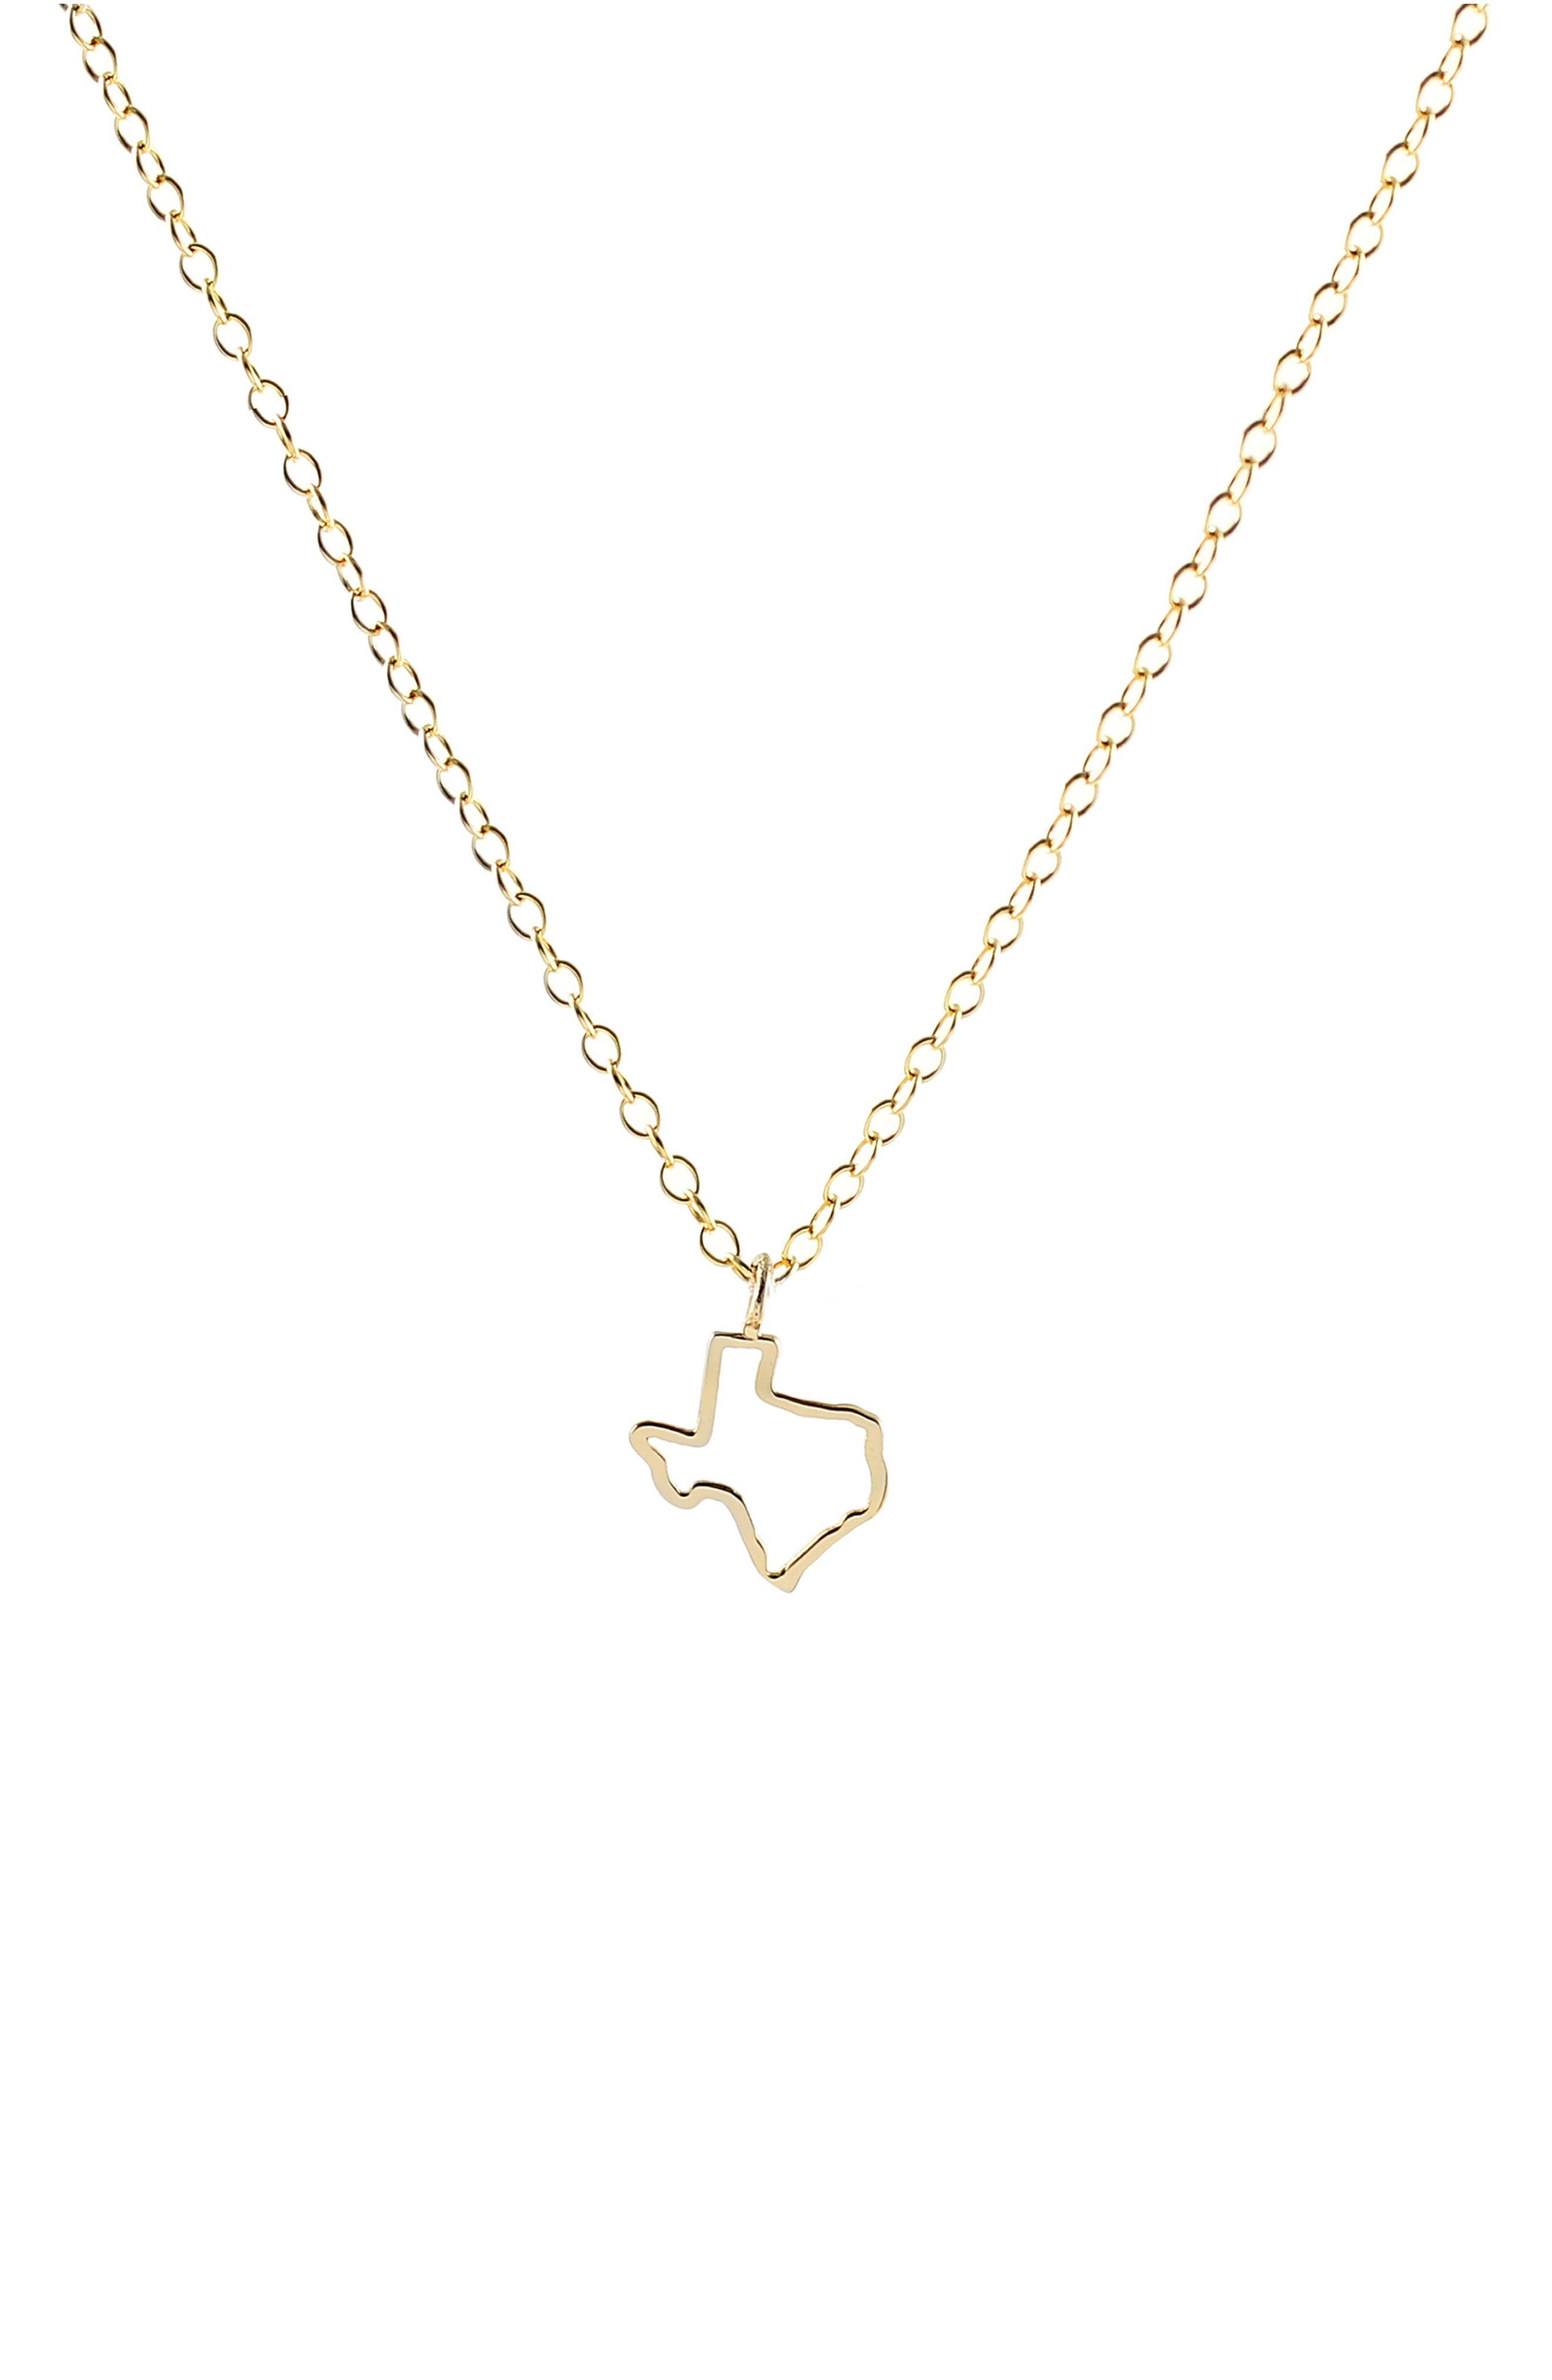 Texas Outline Charm Necklace,                             Main thumbnail 1, color,                             Texas - Gold